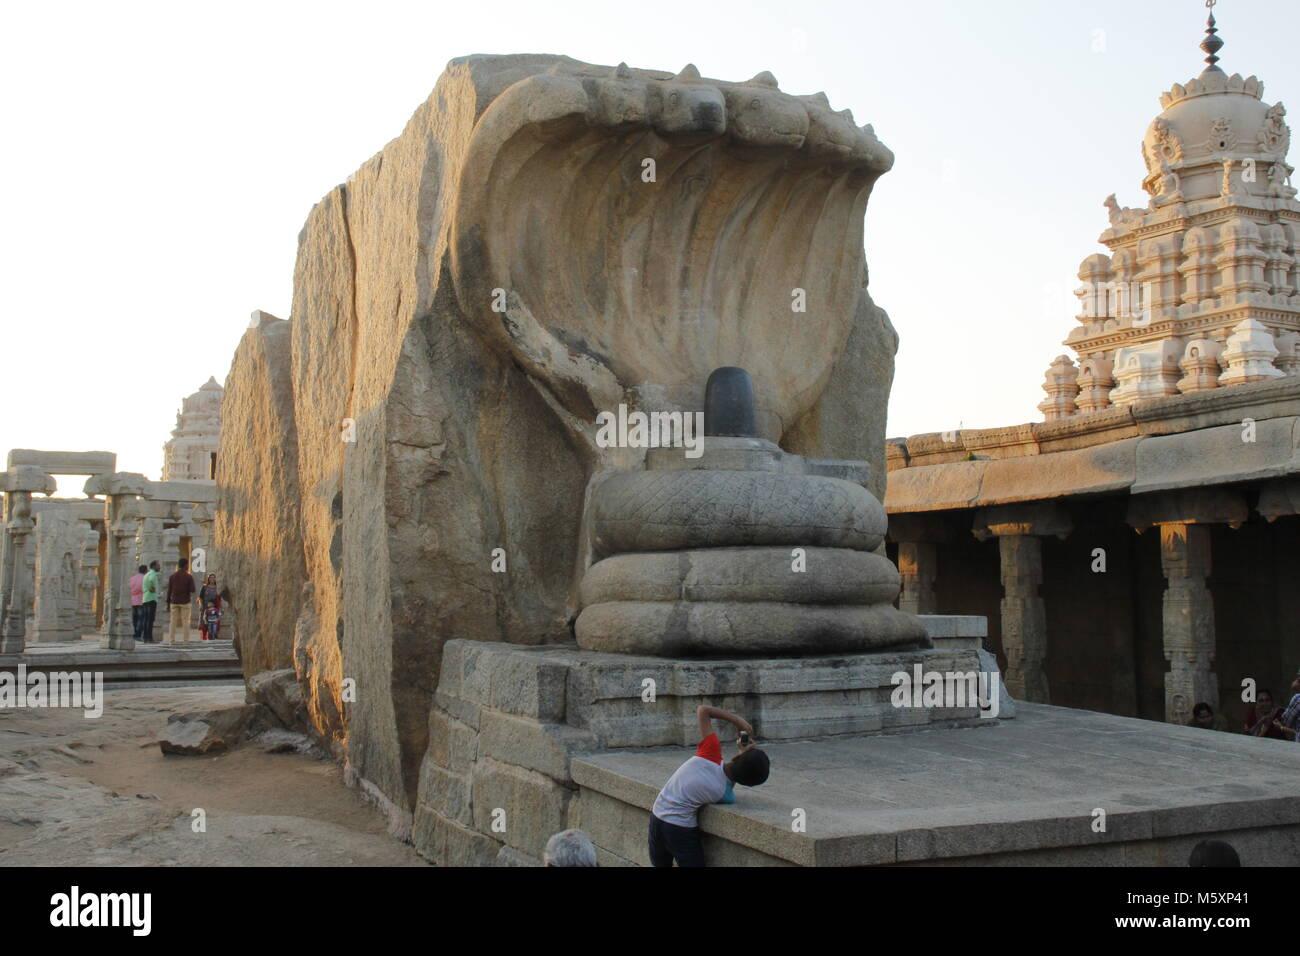 Monolithic hooded serpent guarding the linga at Lepakshi Temple, Andhra Pradesh, India - Stock Image